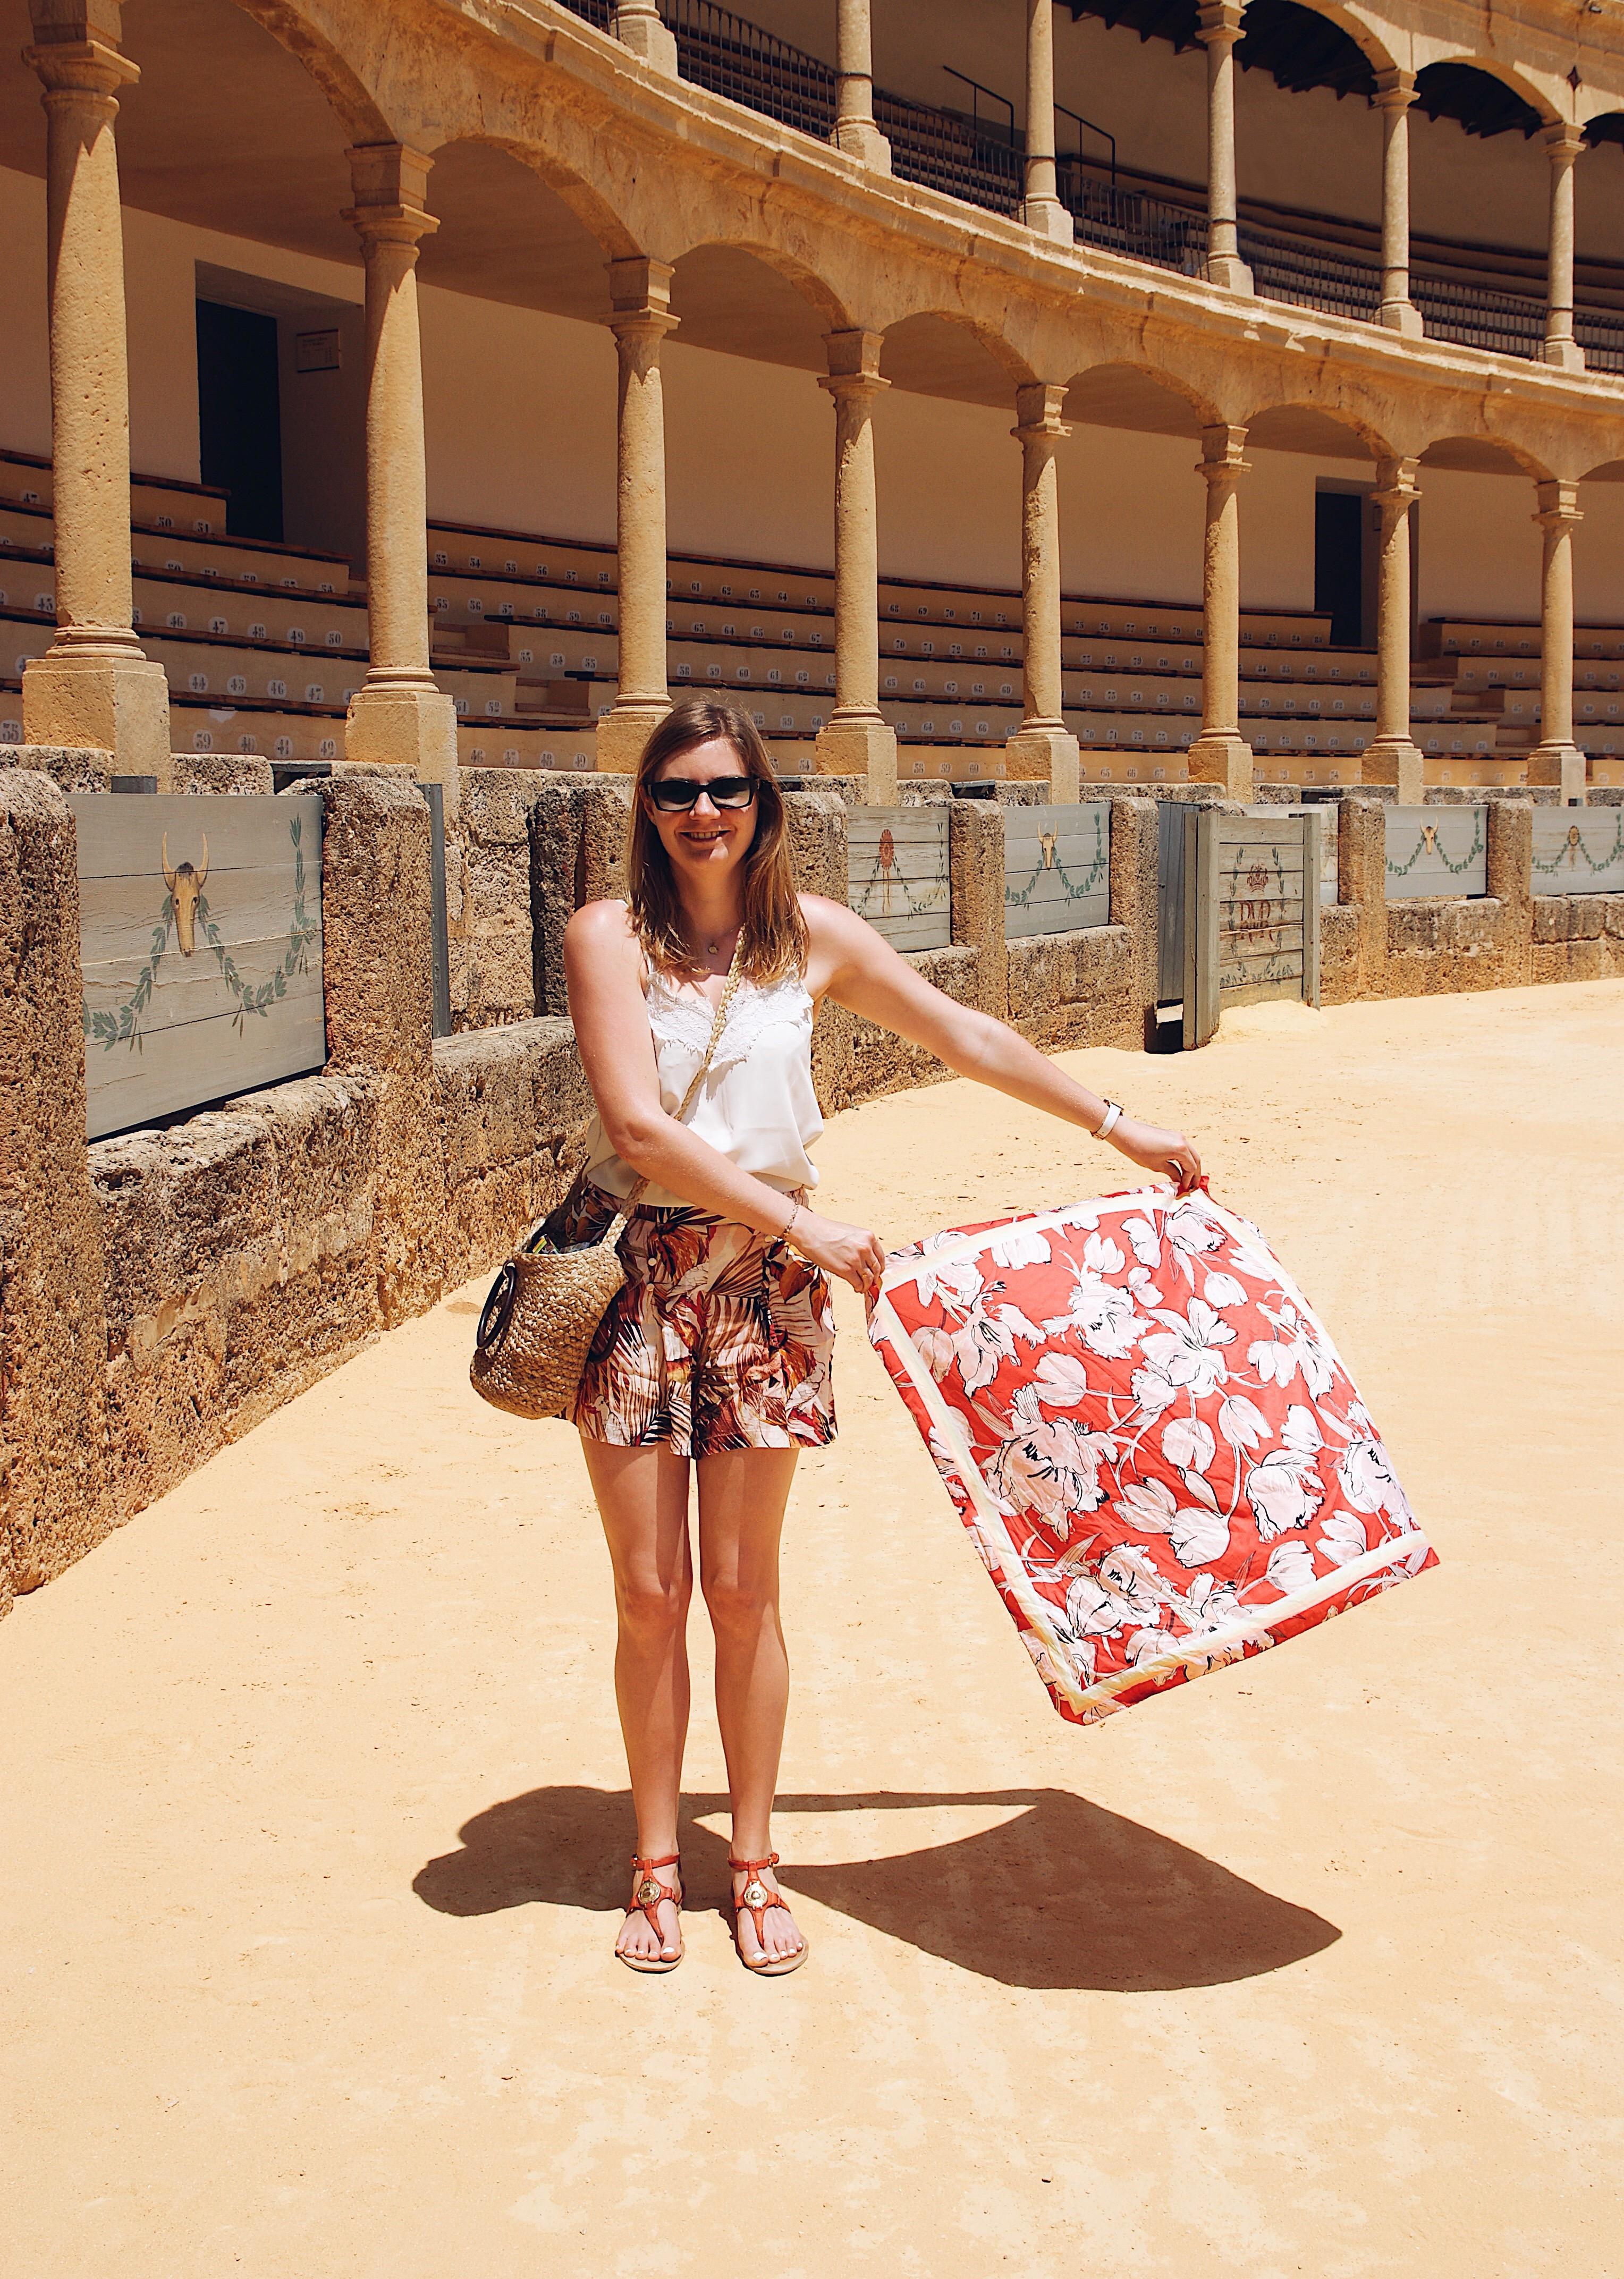 Ronda Stierkampfarena, Ronda Reisebericht Spanien Andalusien Reise